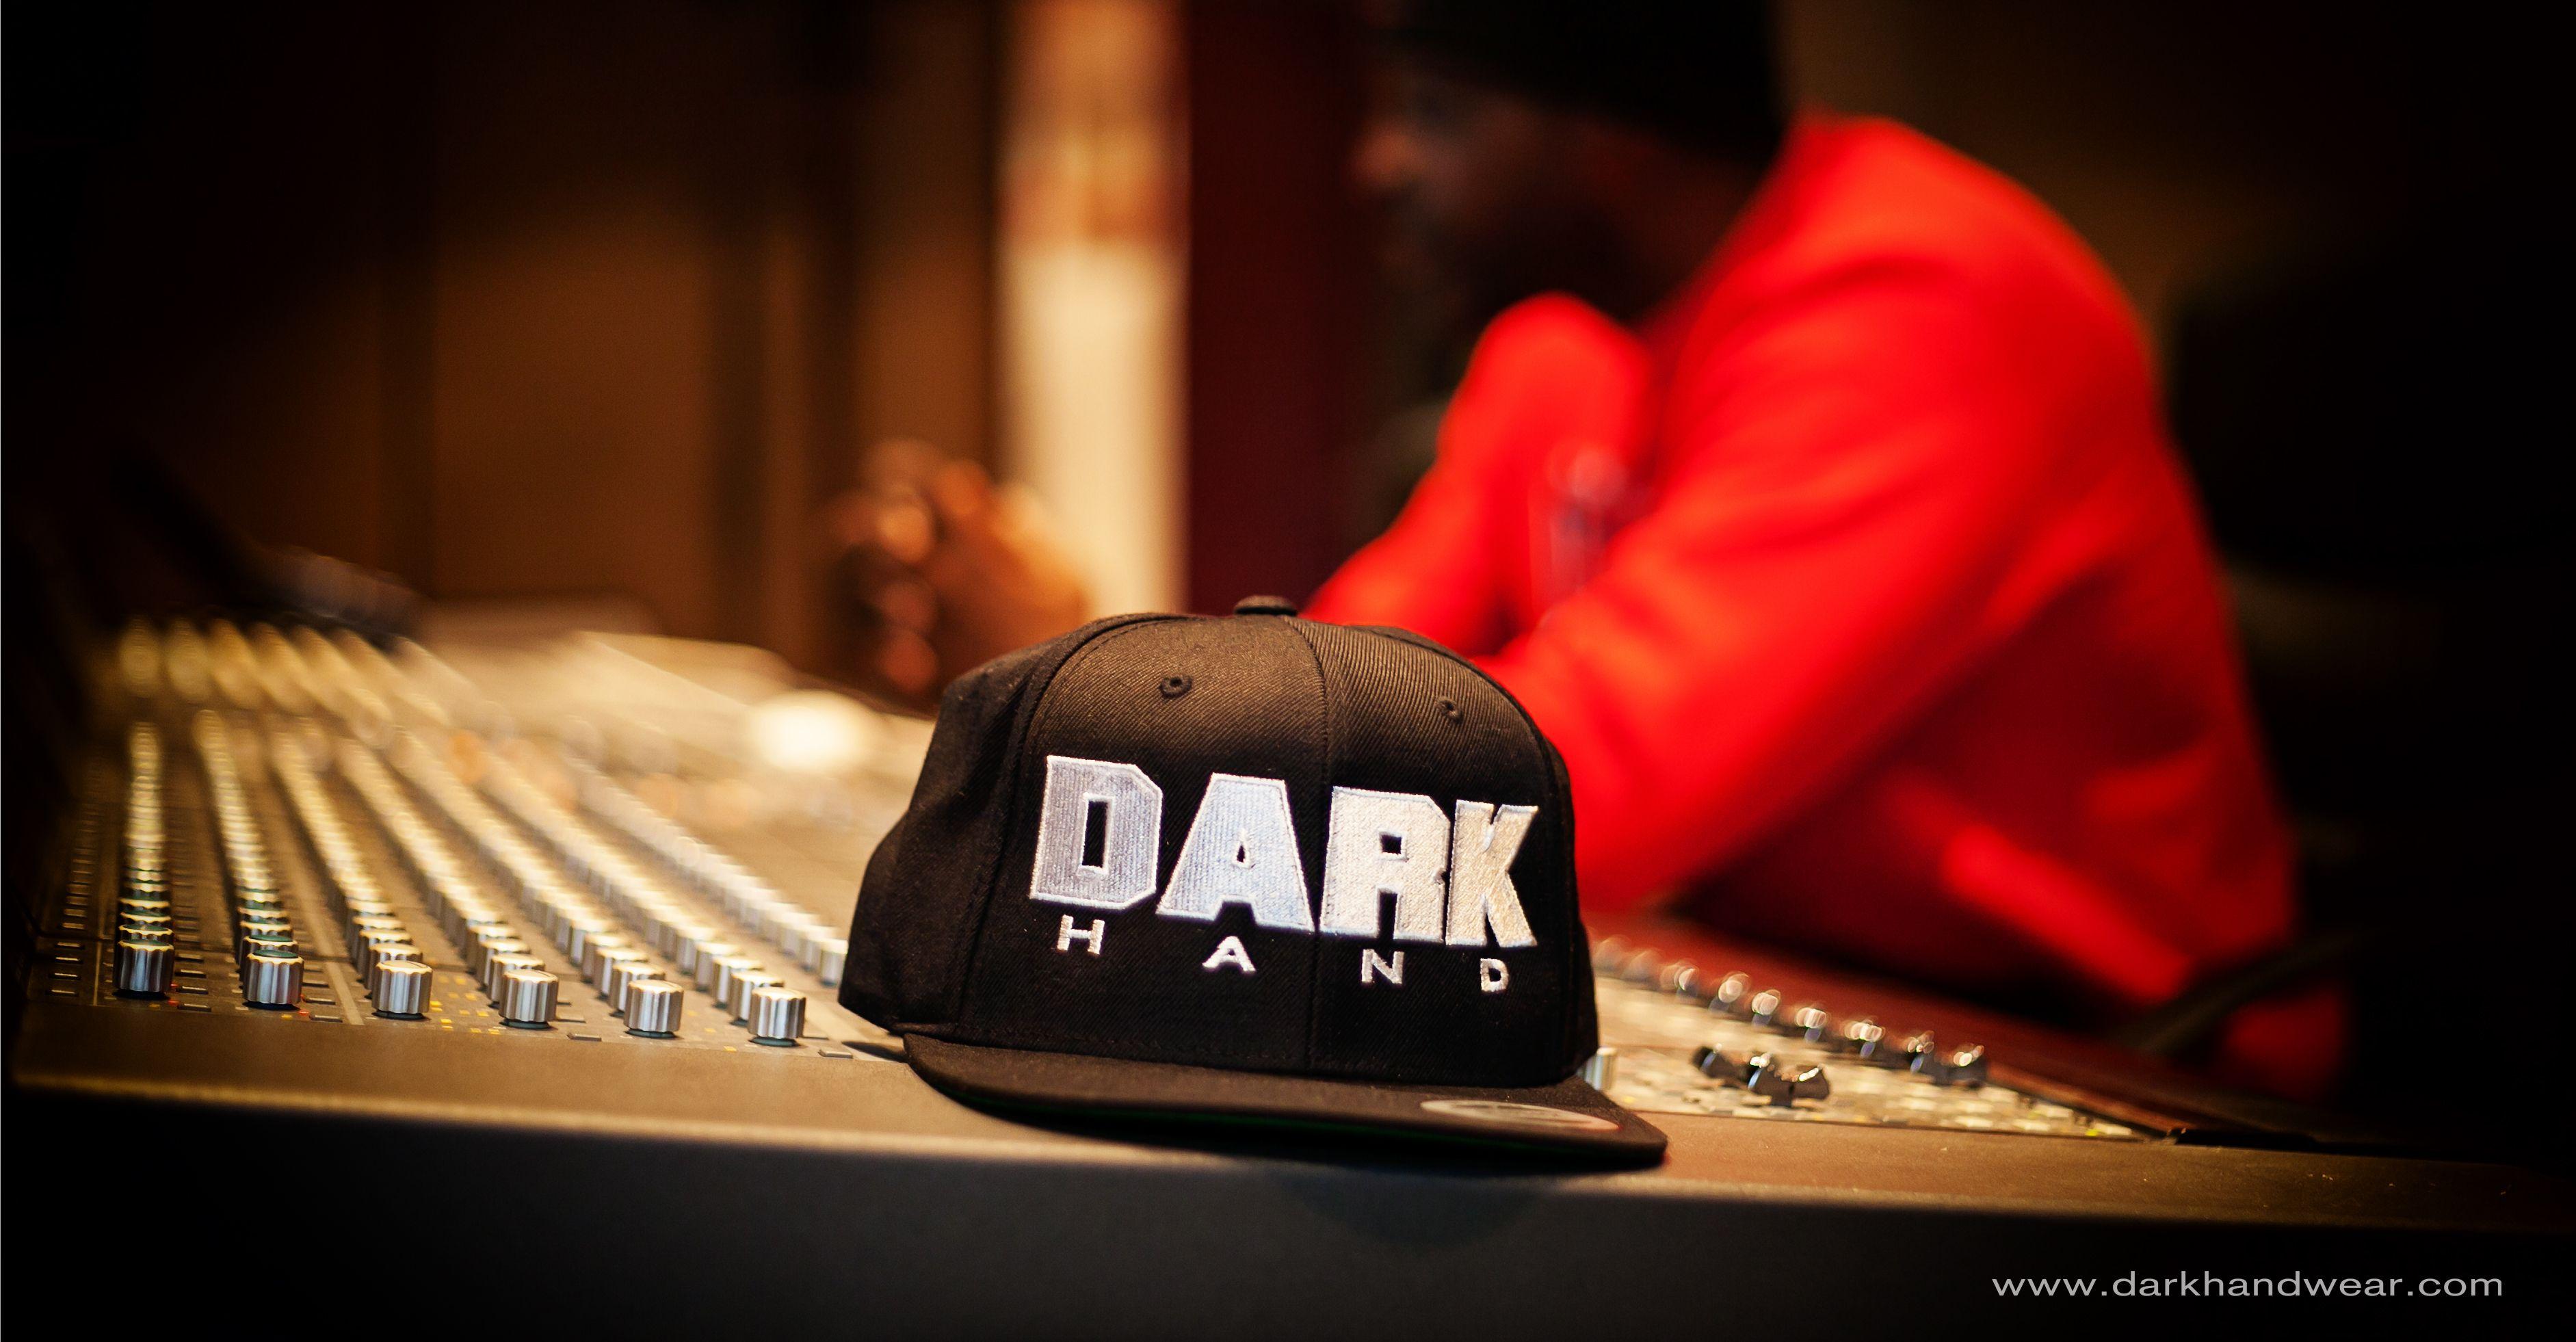 Dark Hand SnapBack #Swag #SnapBack #DarkHand #Fashion #StreetWear from: www.darkhandwear.com